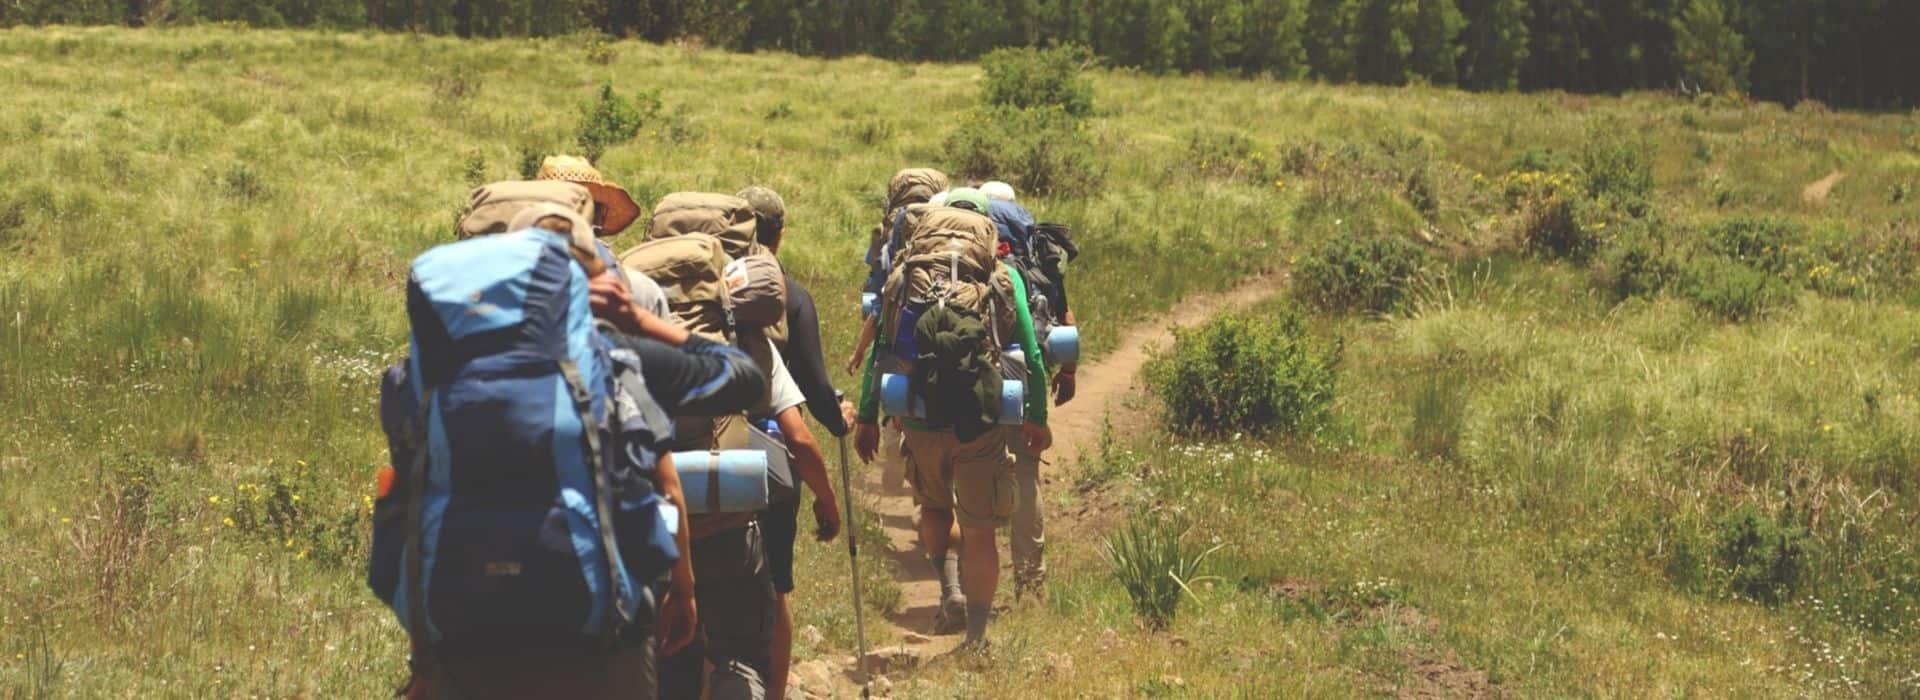 Ultimate Packing List for Everest Base Camp Trek